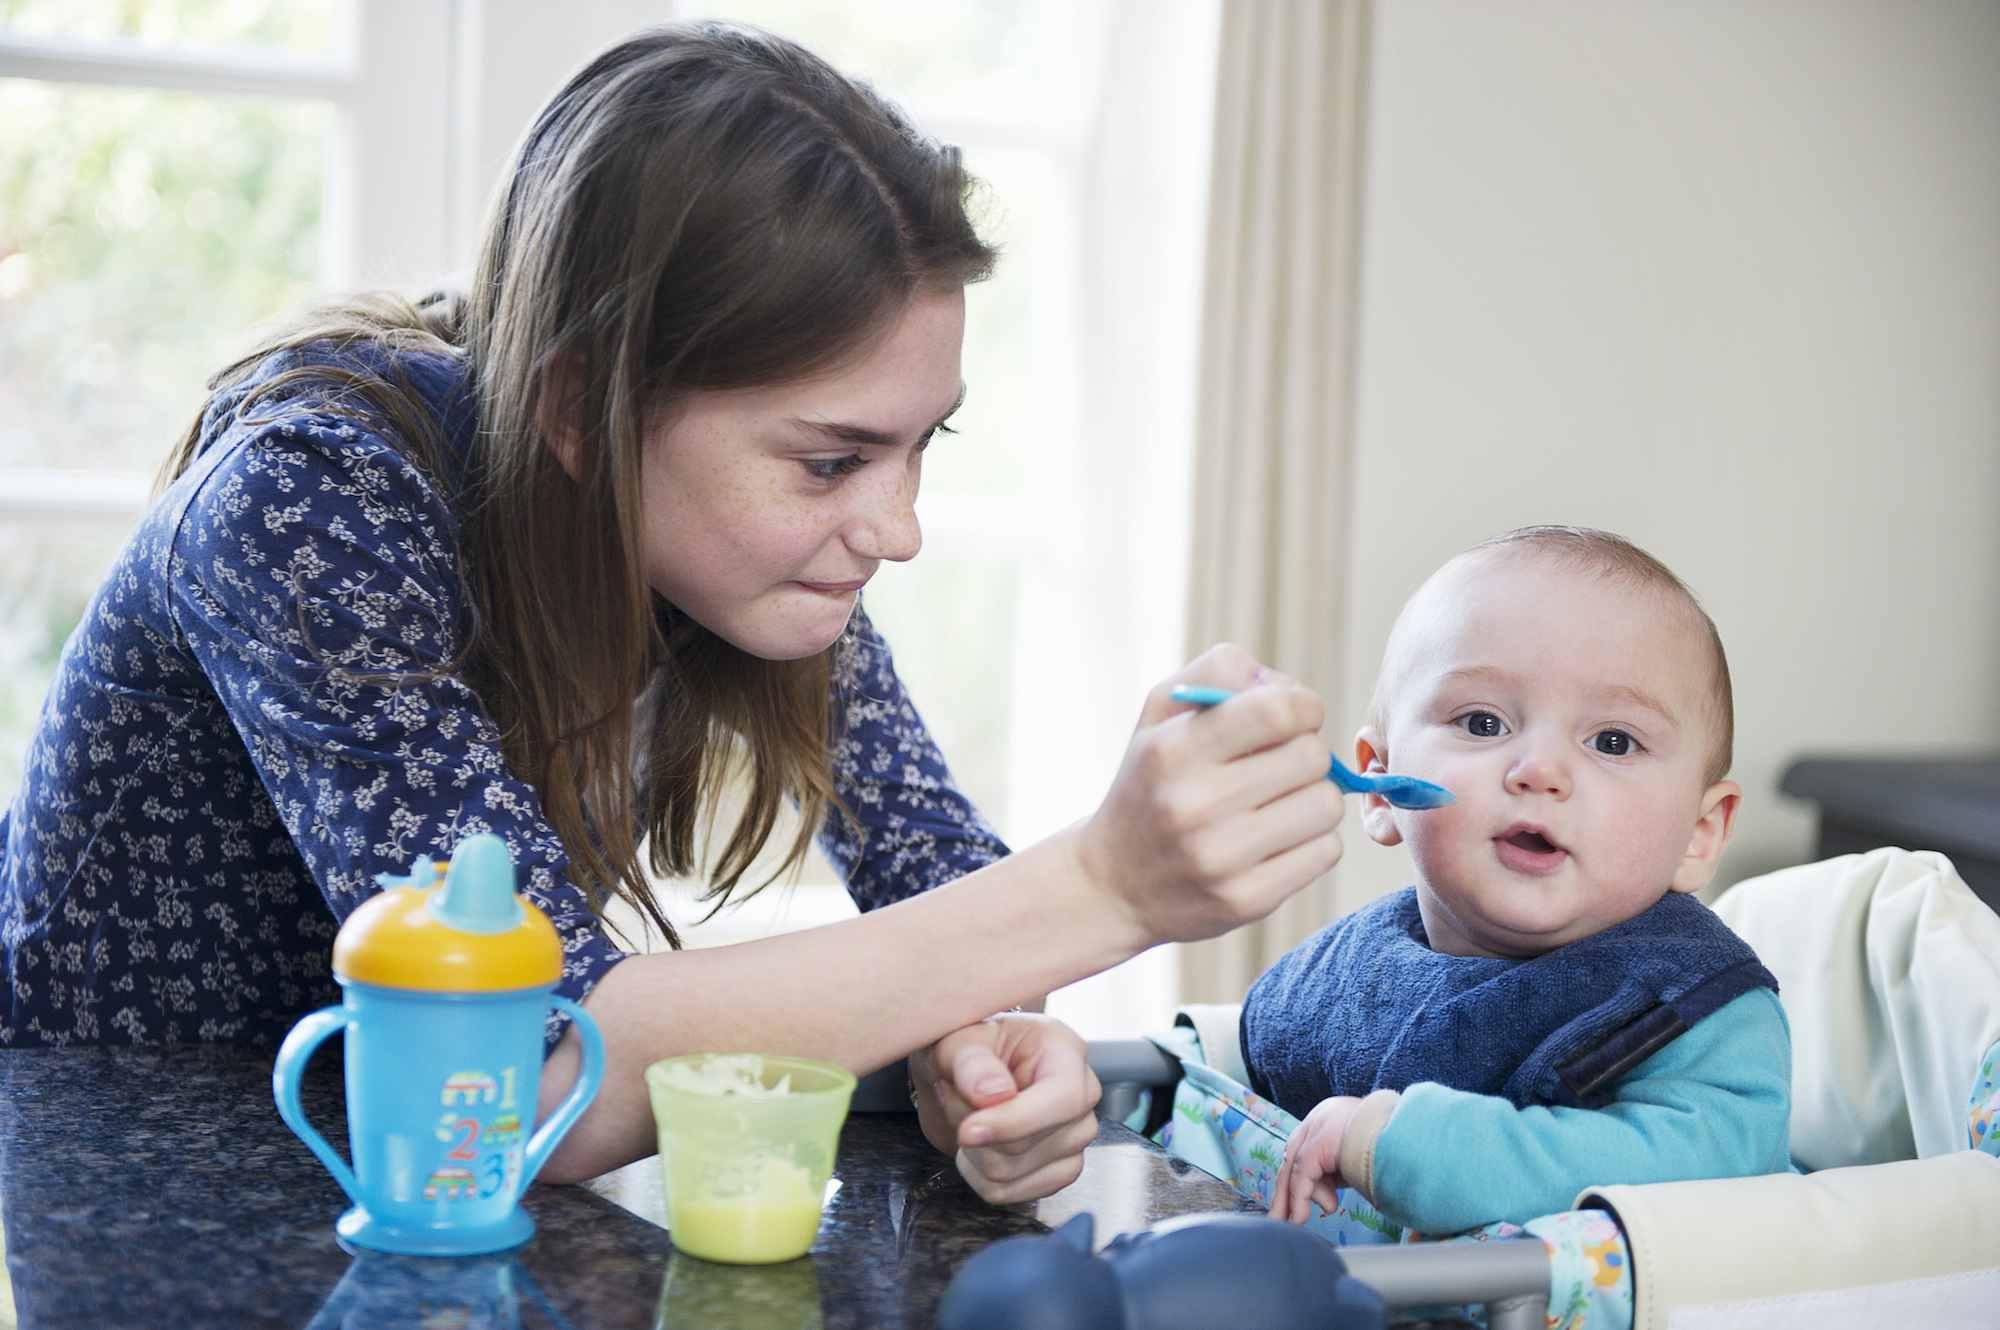 girl earning money through babysitting